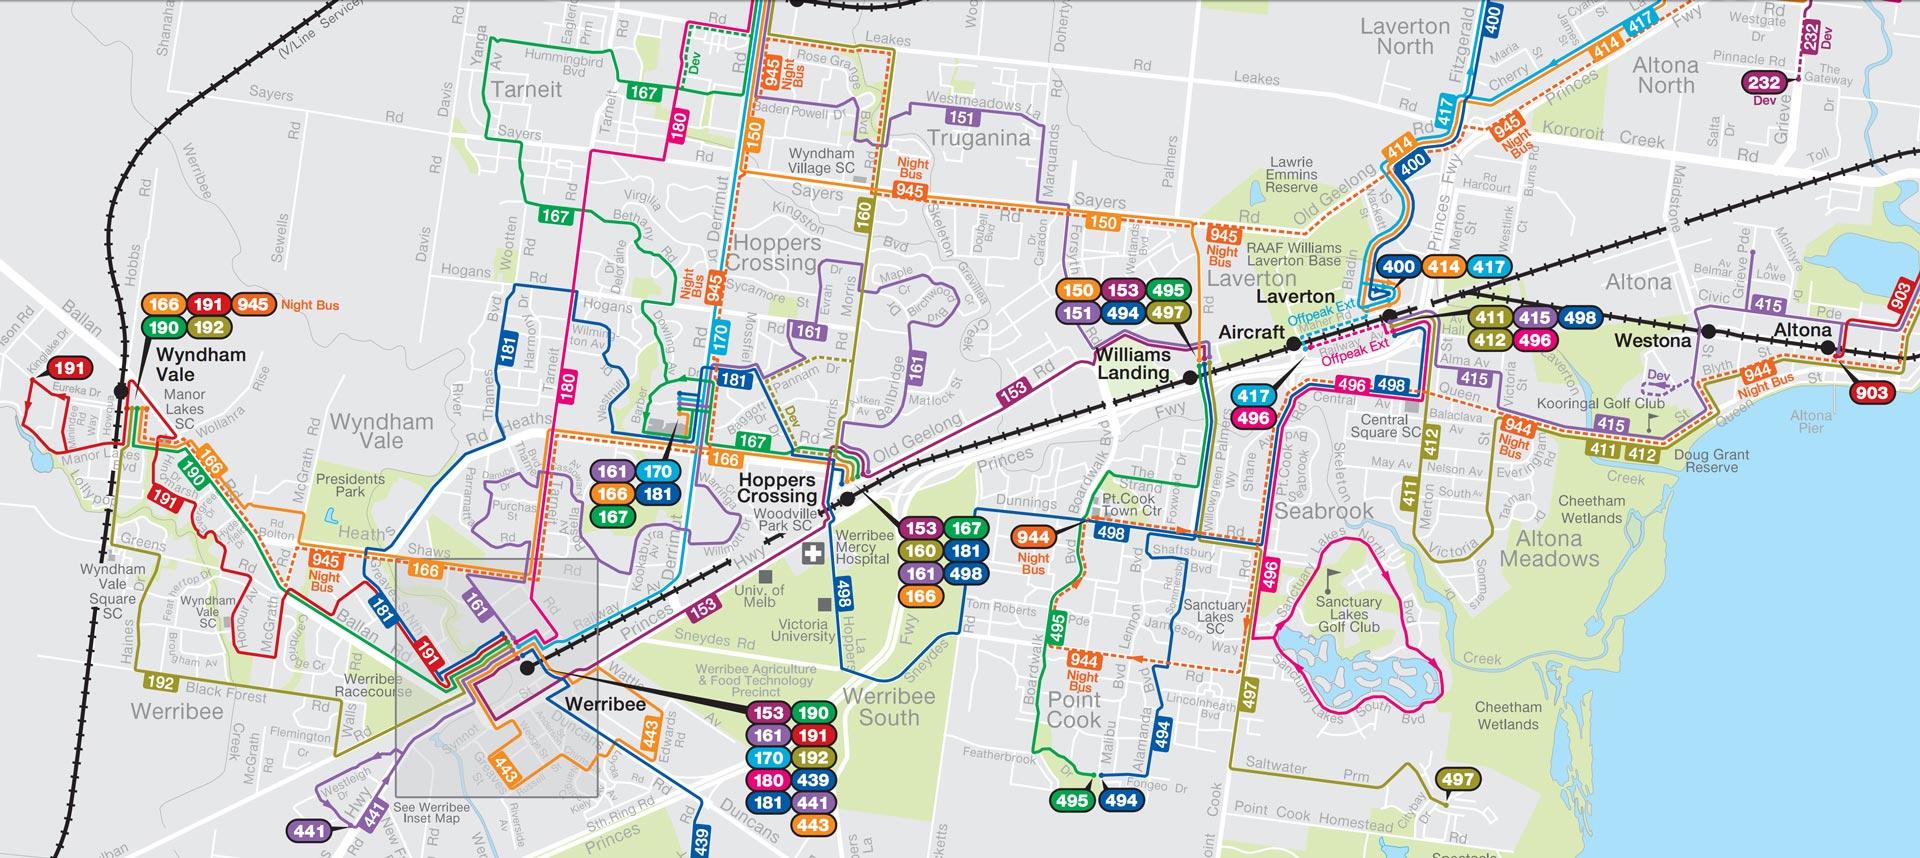 Wyndham bus timetables & maps | CDC Victoria